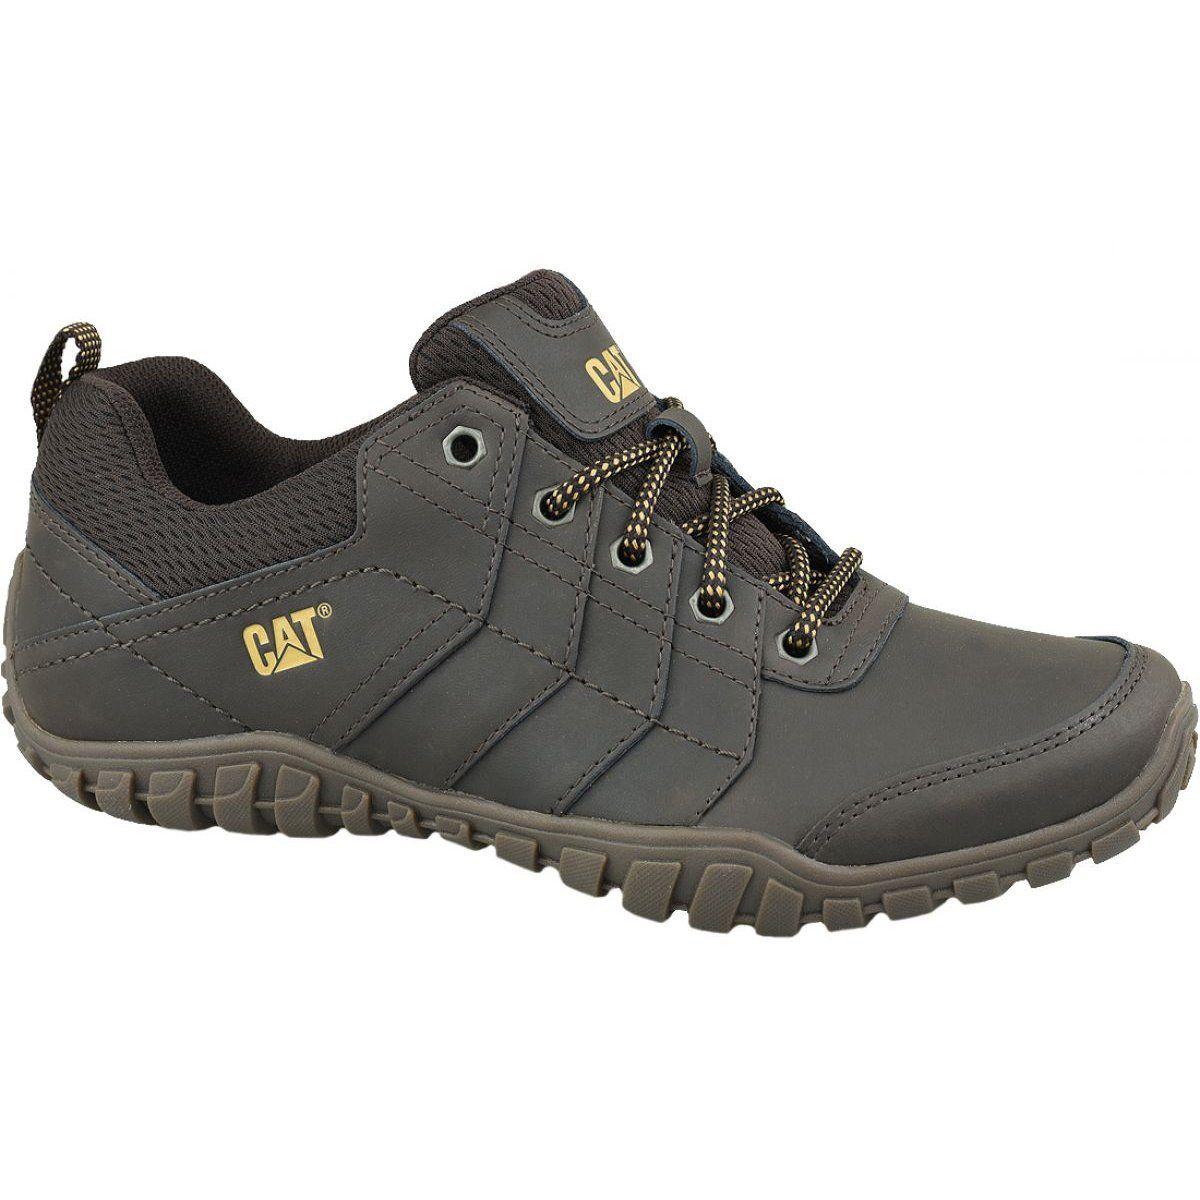 Buty Caterpillar Instruct M P722310 Brazowe Hiking Boots Boots Dc Sneaker